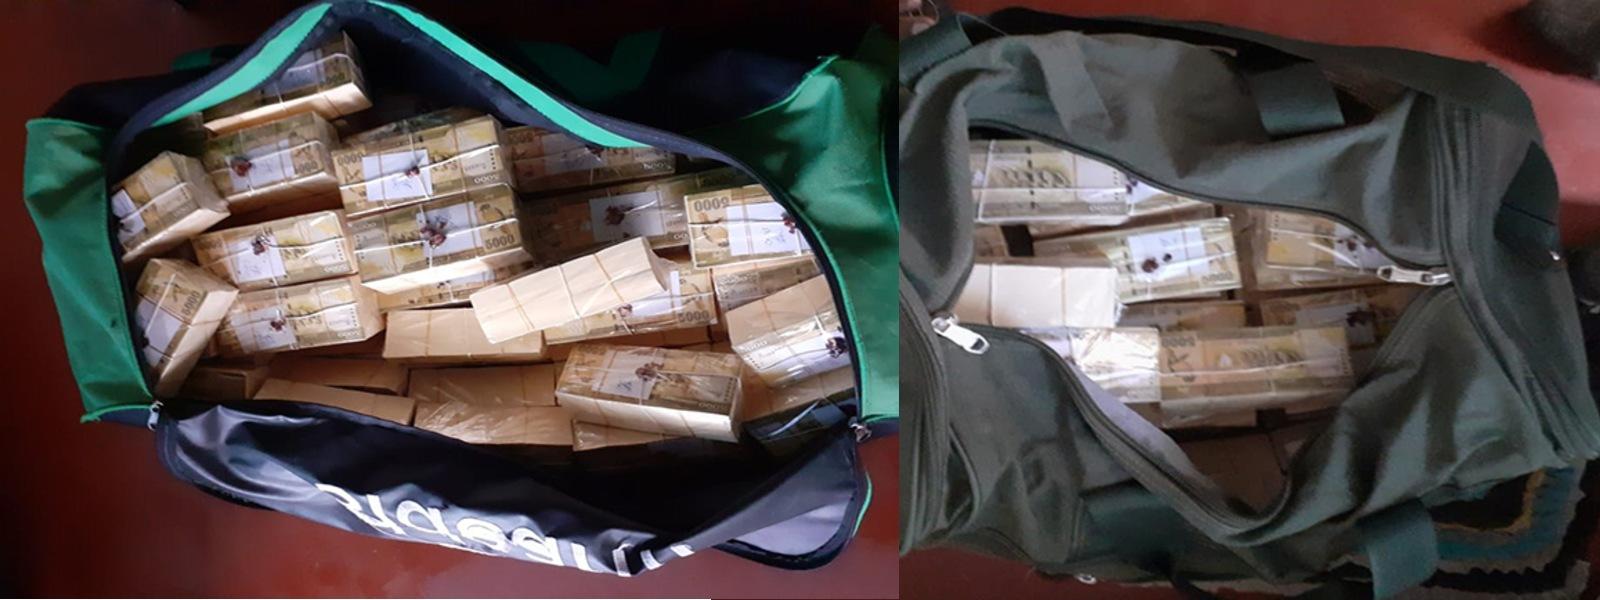 Rs. 01 Billion in Fake Notes seized in Mulleriyawa